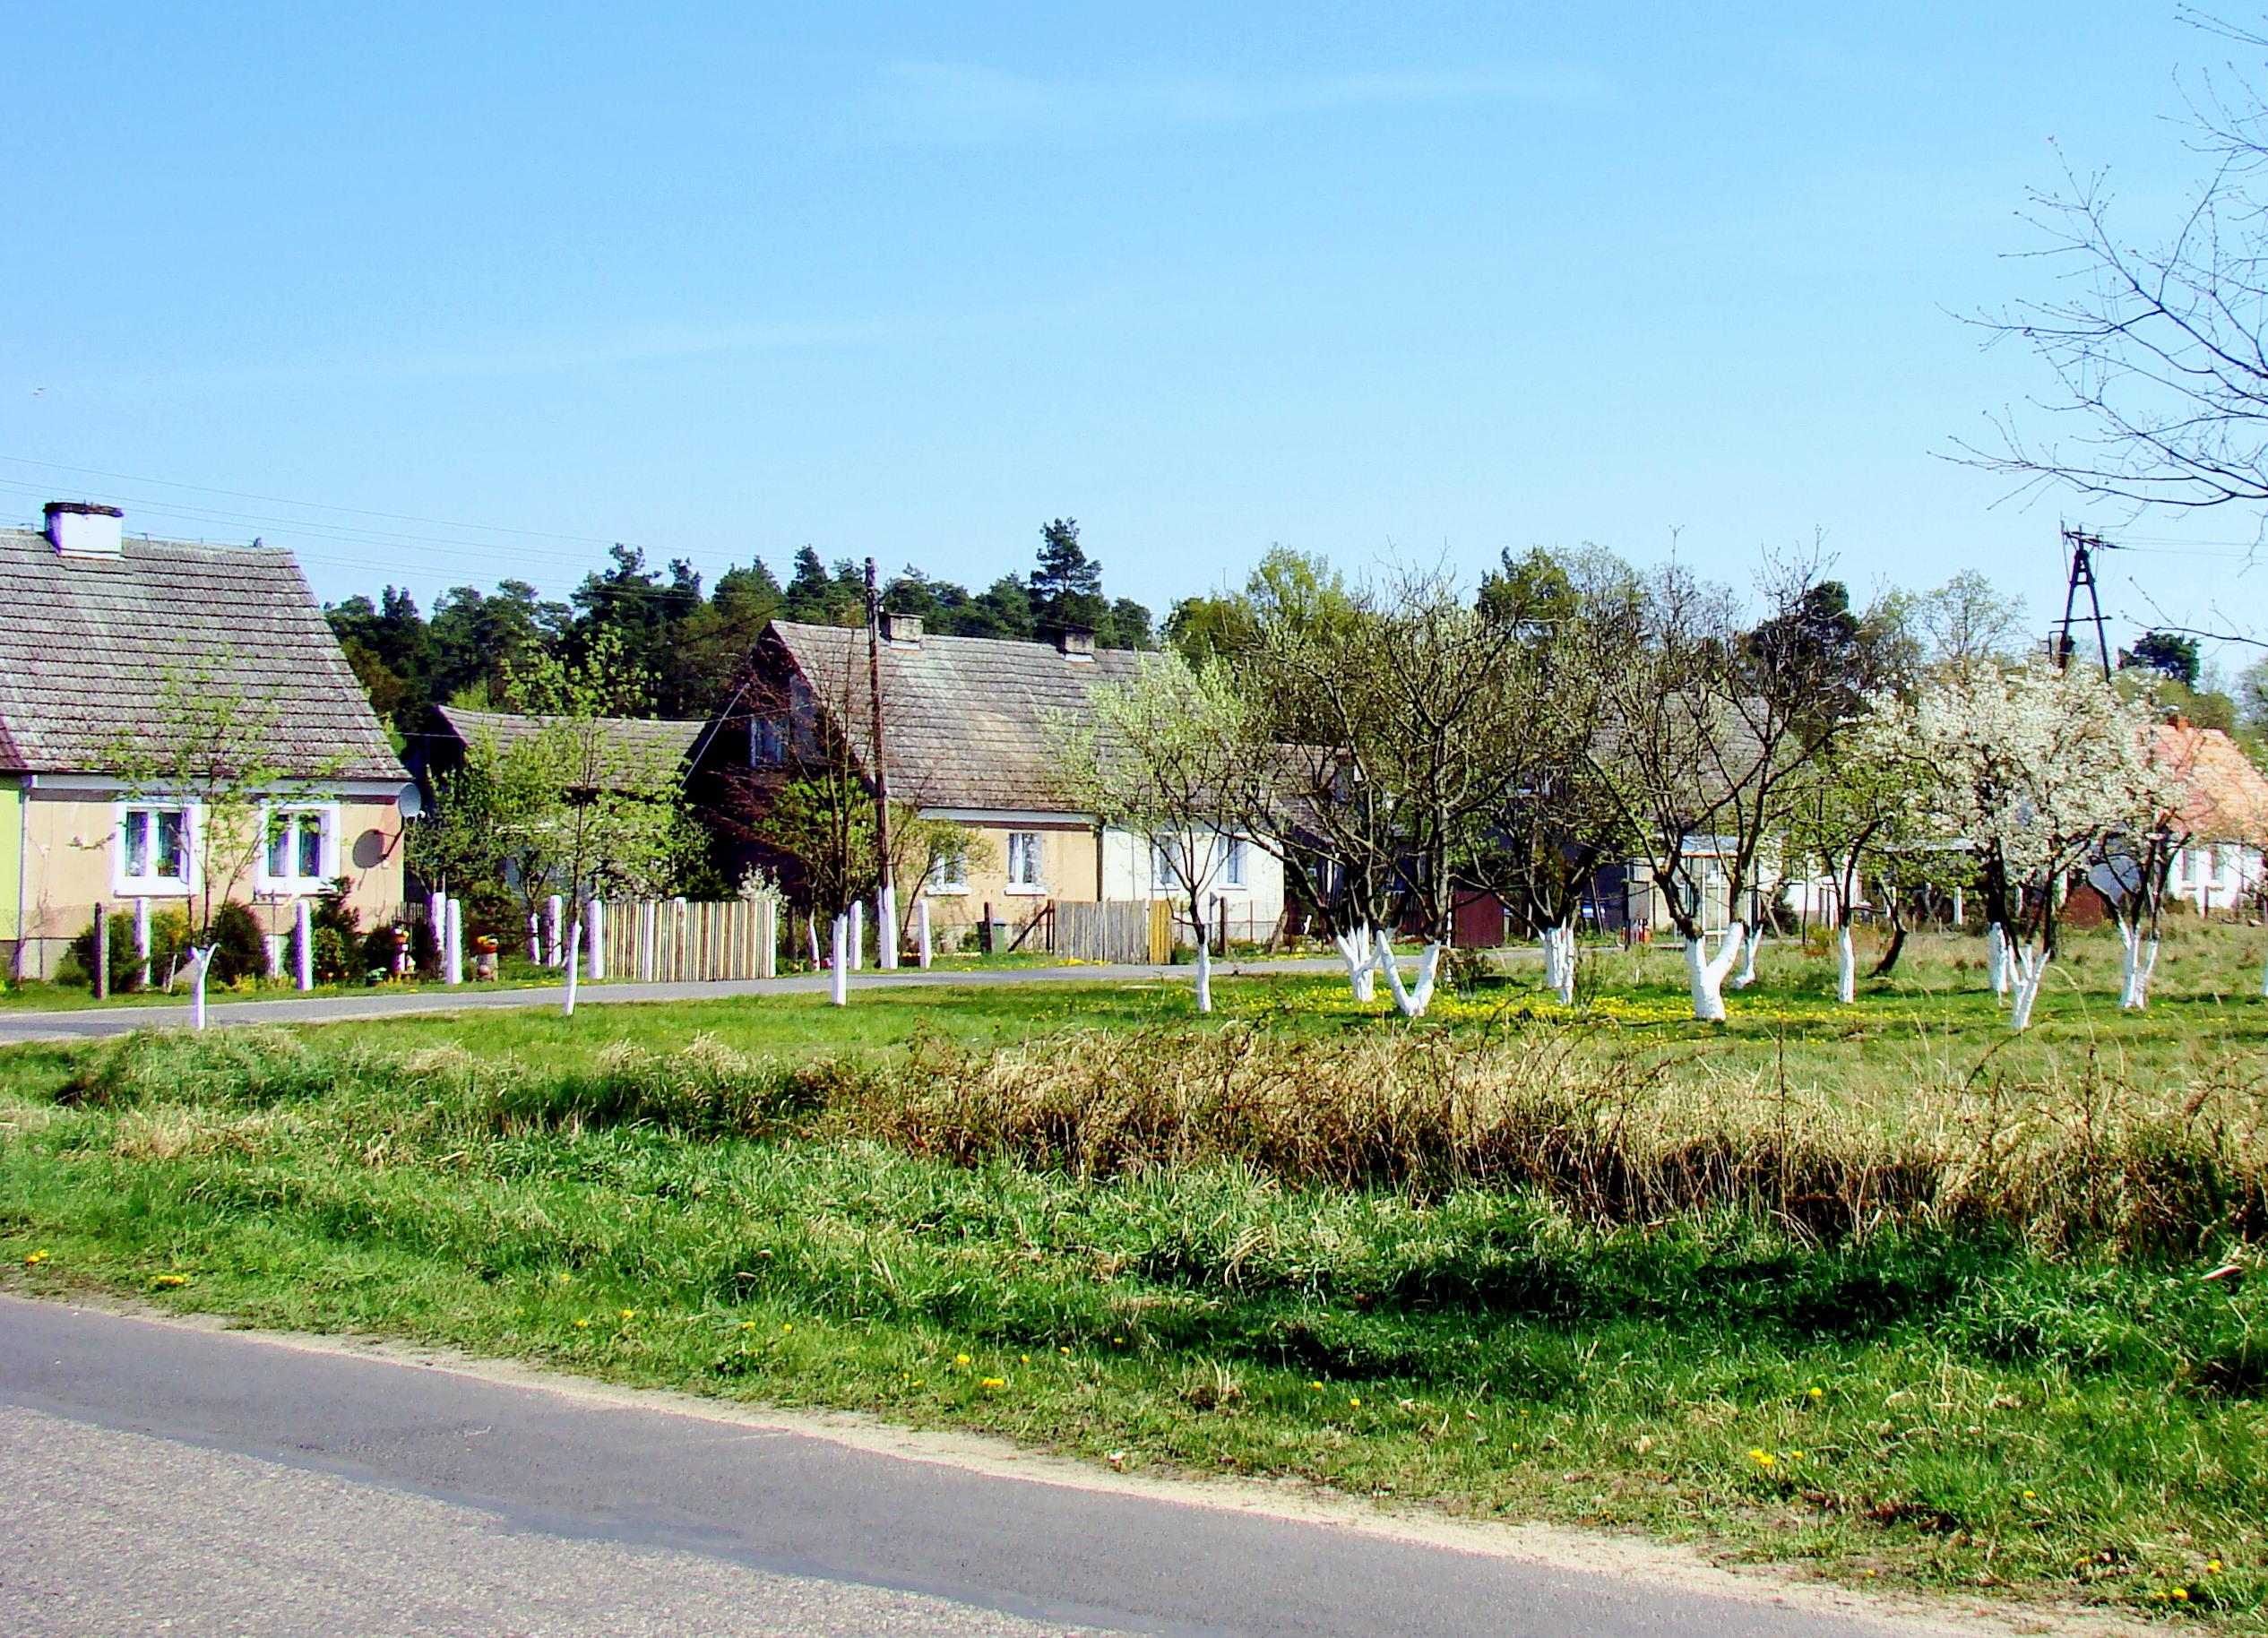 Drogoradz, West Pomeranian Voivodeship